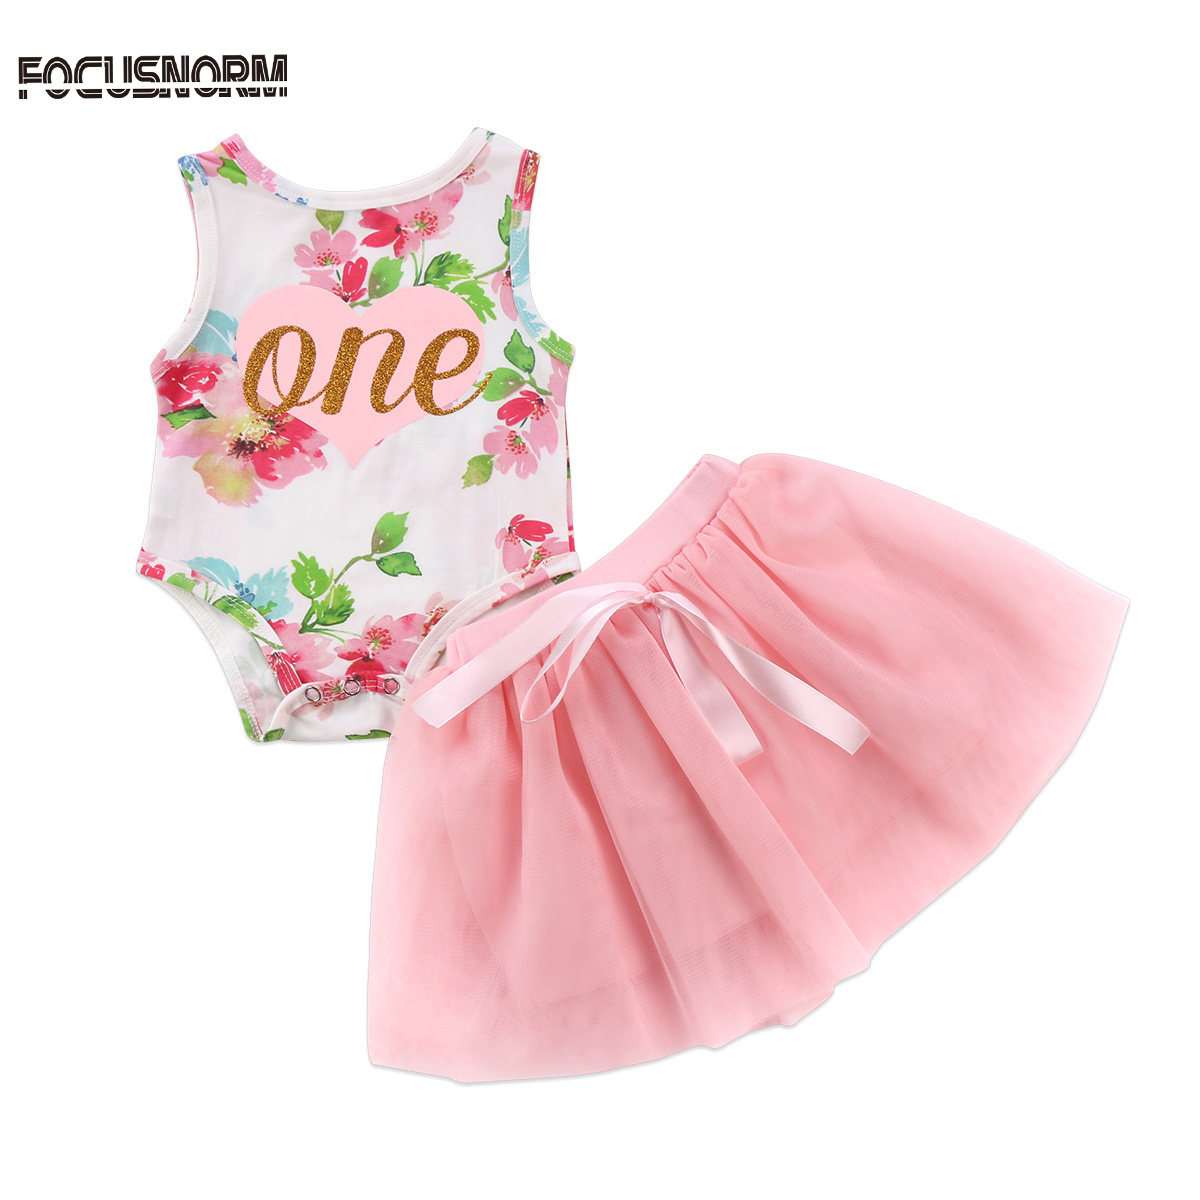 Adorable Newborn Baby Girls Xmas Princess Floral Sleeveless Bodysuit+Bow Tulle Tutu Skirt 2Pcs Outfits